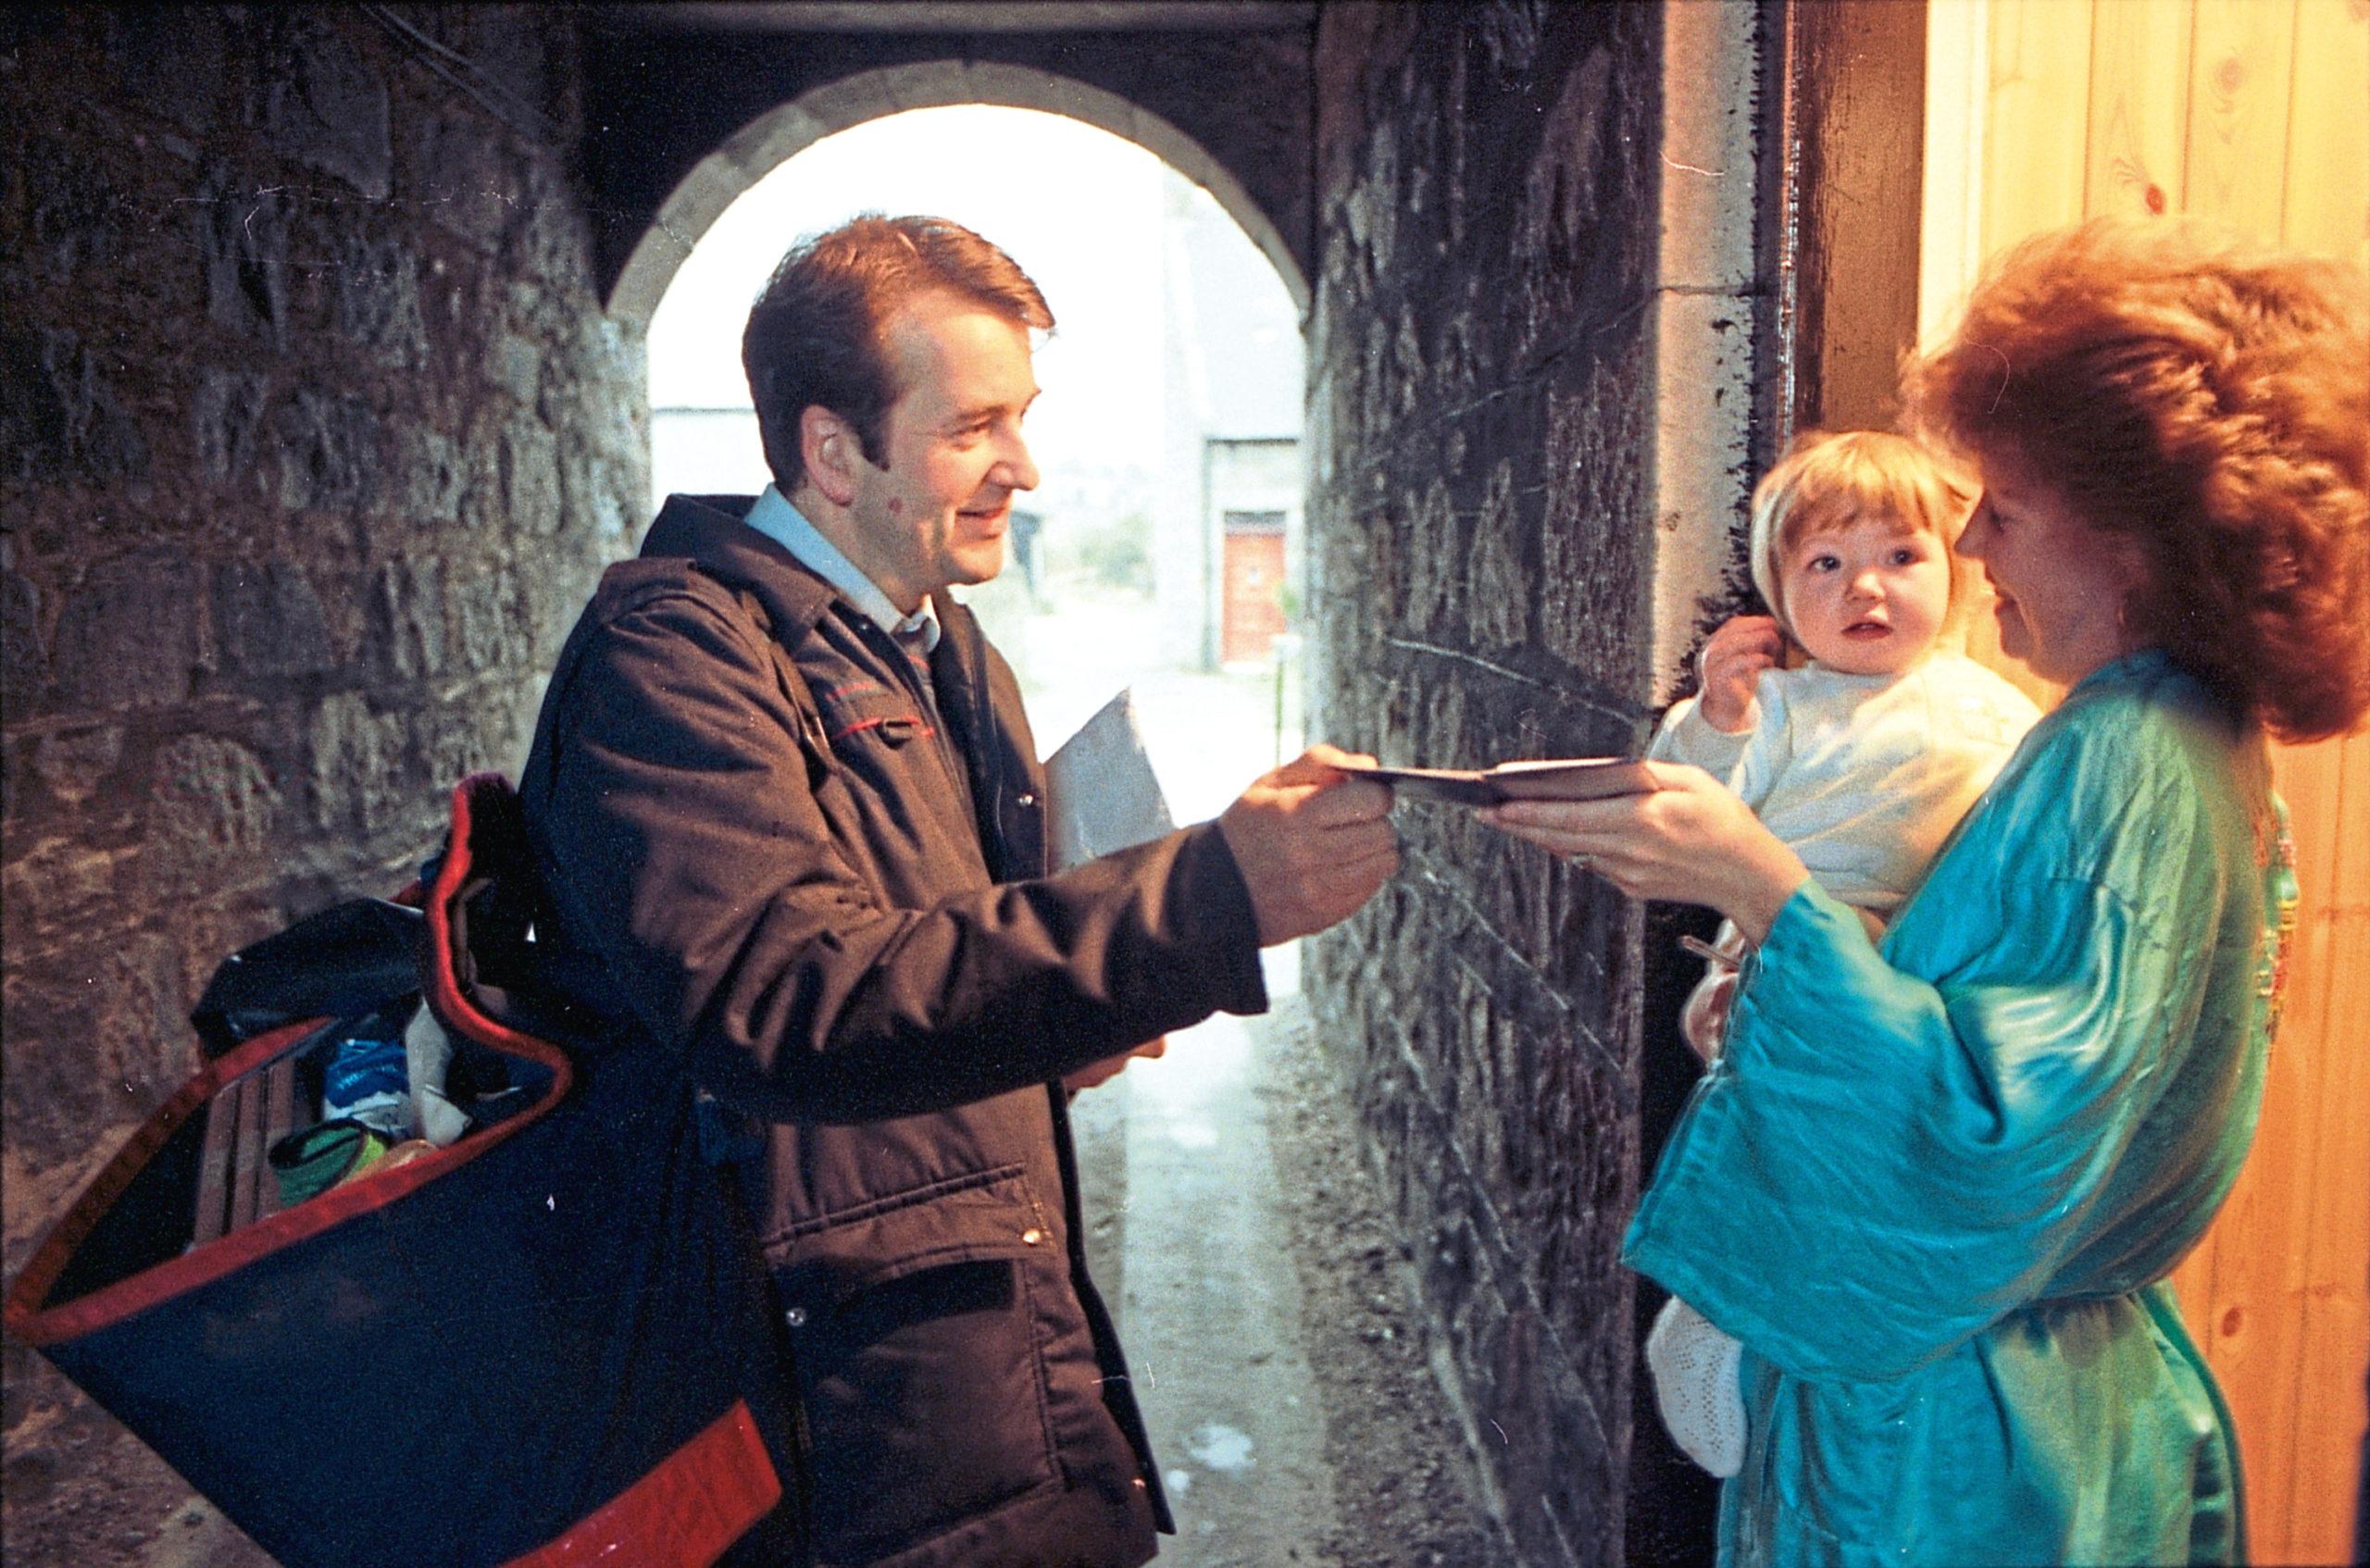 AN 015890_5A 1993-11-30 Holburn Street (C)AJL Neg. No. 015890 (Frame 5A) Postmen feature. Postman Jim Smith delivering mail to Linda Ross, Holburn Street. 30 November 1993.